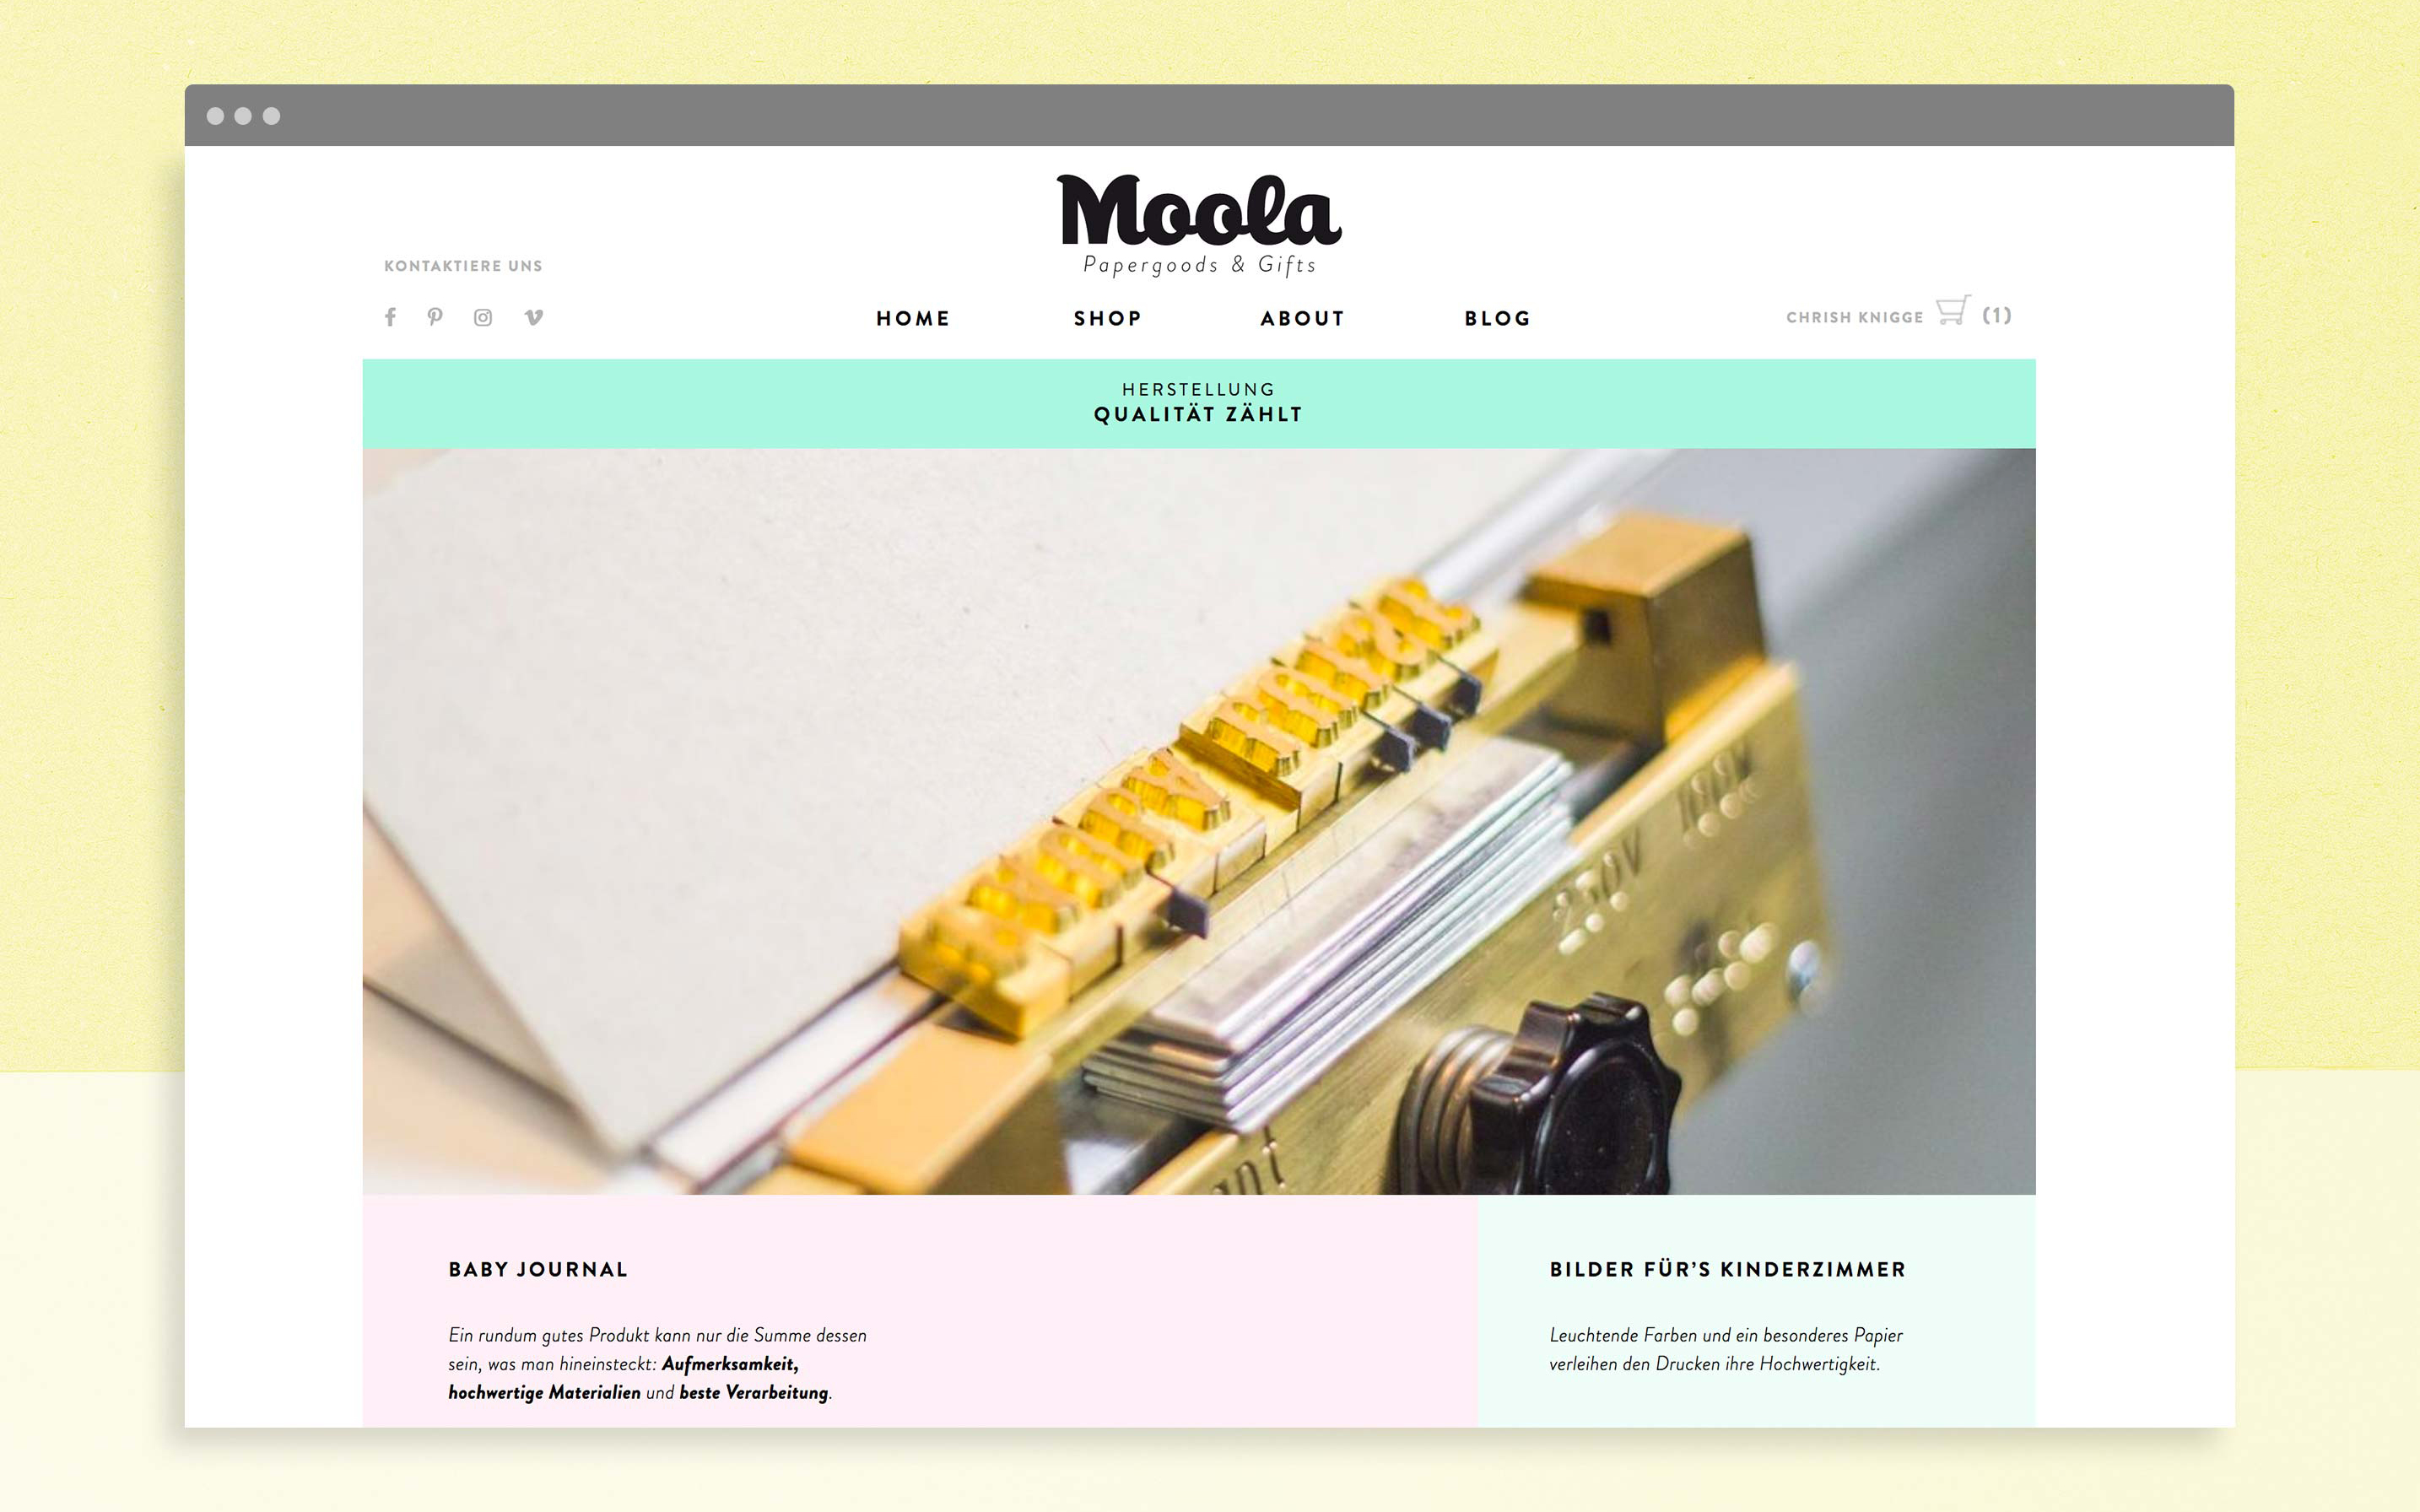 Shop der Website